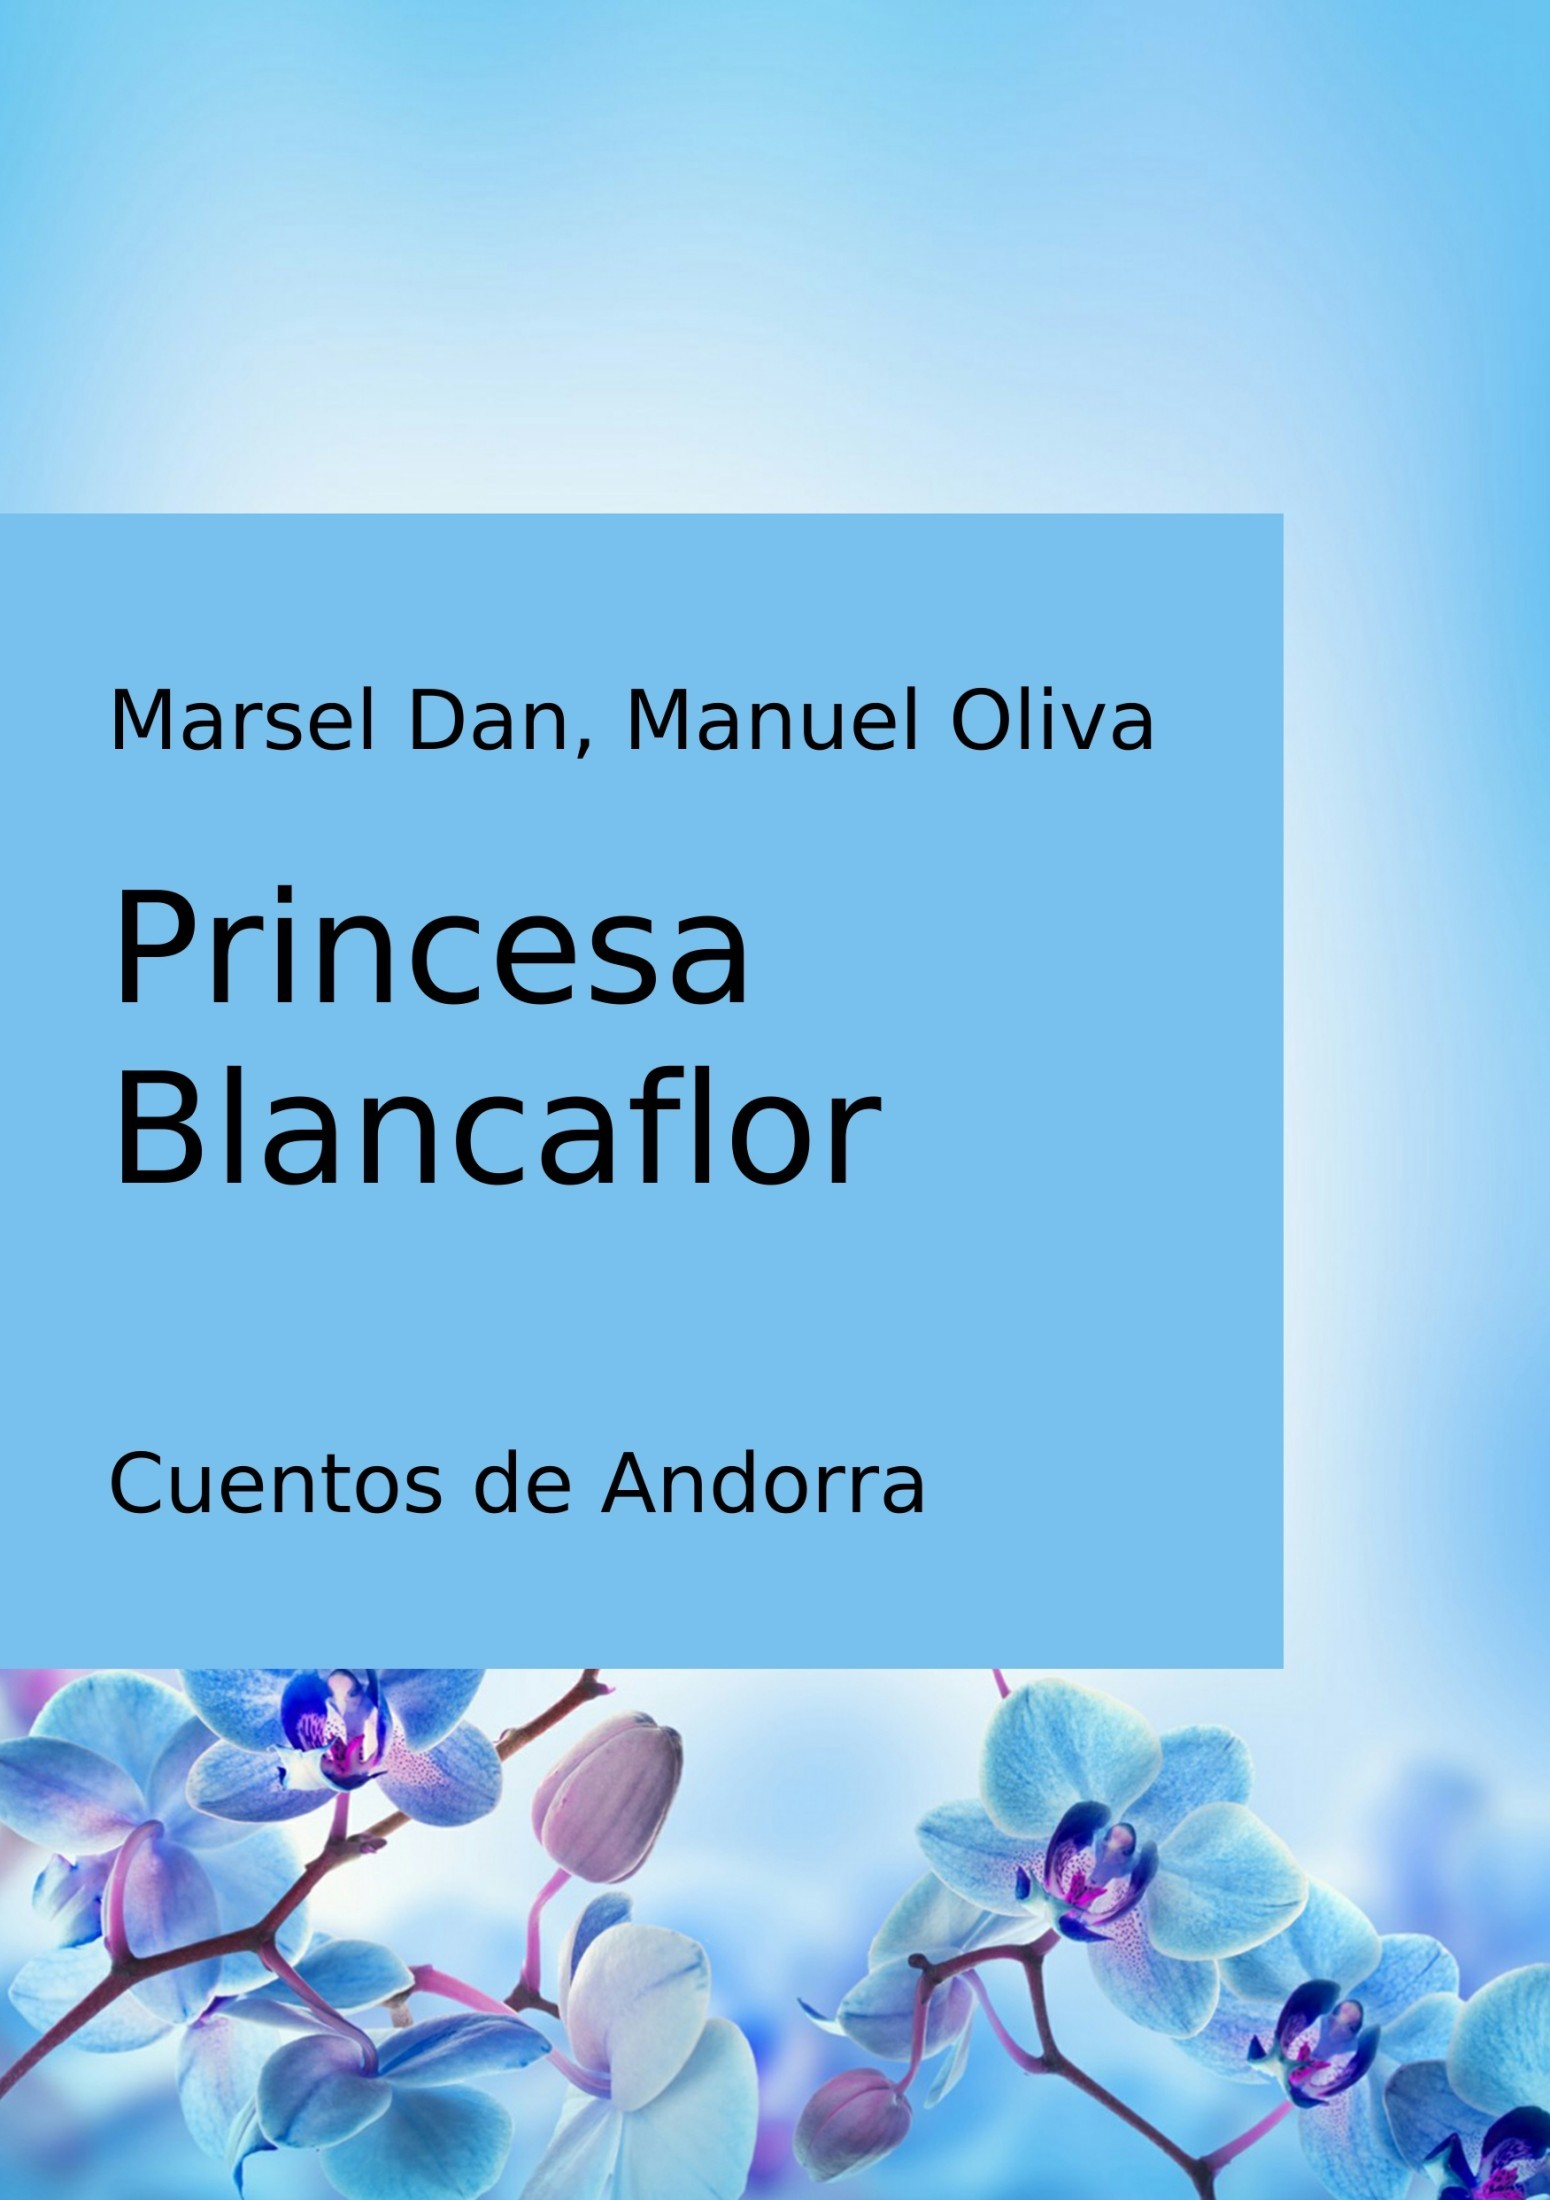 Manuel Oliva Gomez, Marsel Dan - Princesa Blancaflor